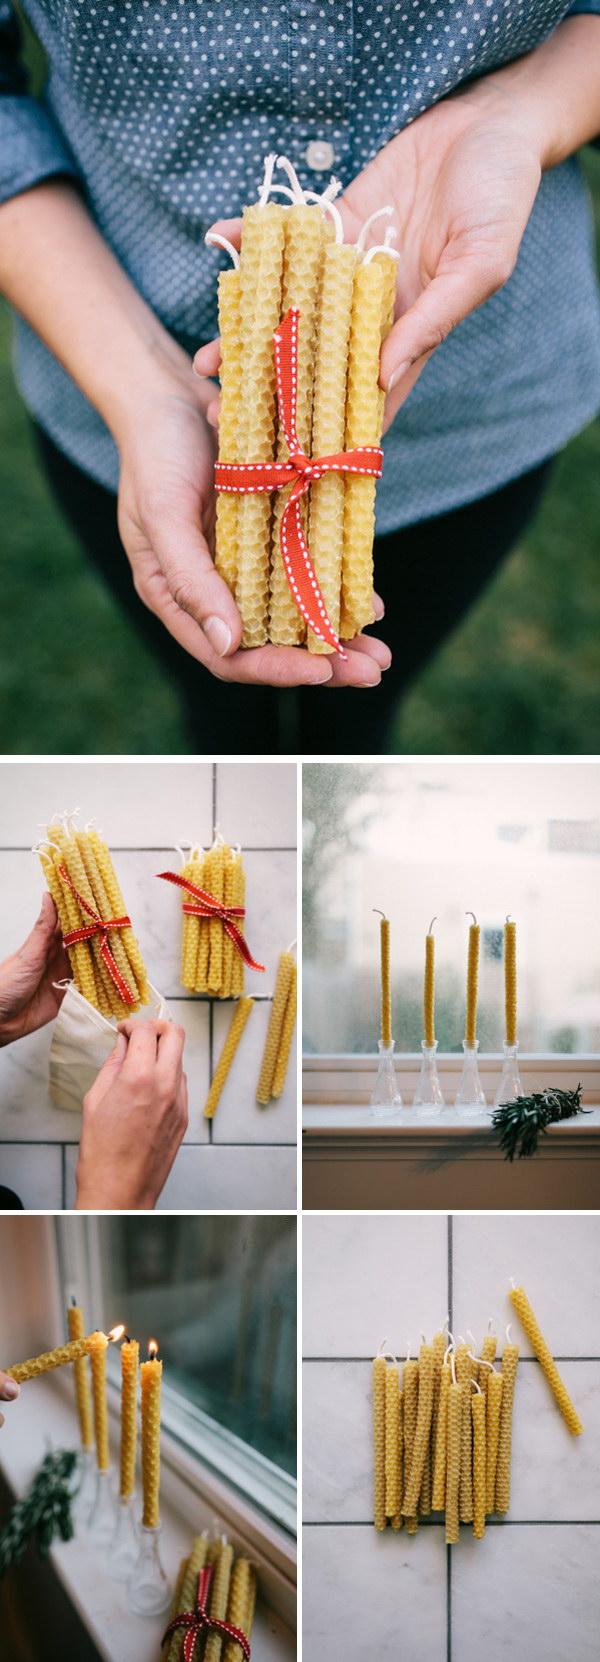 14 DIY Beeswax Candles